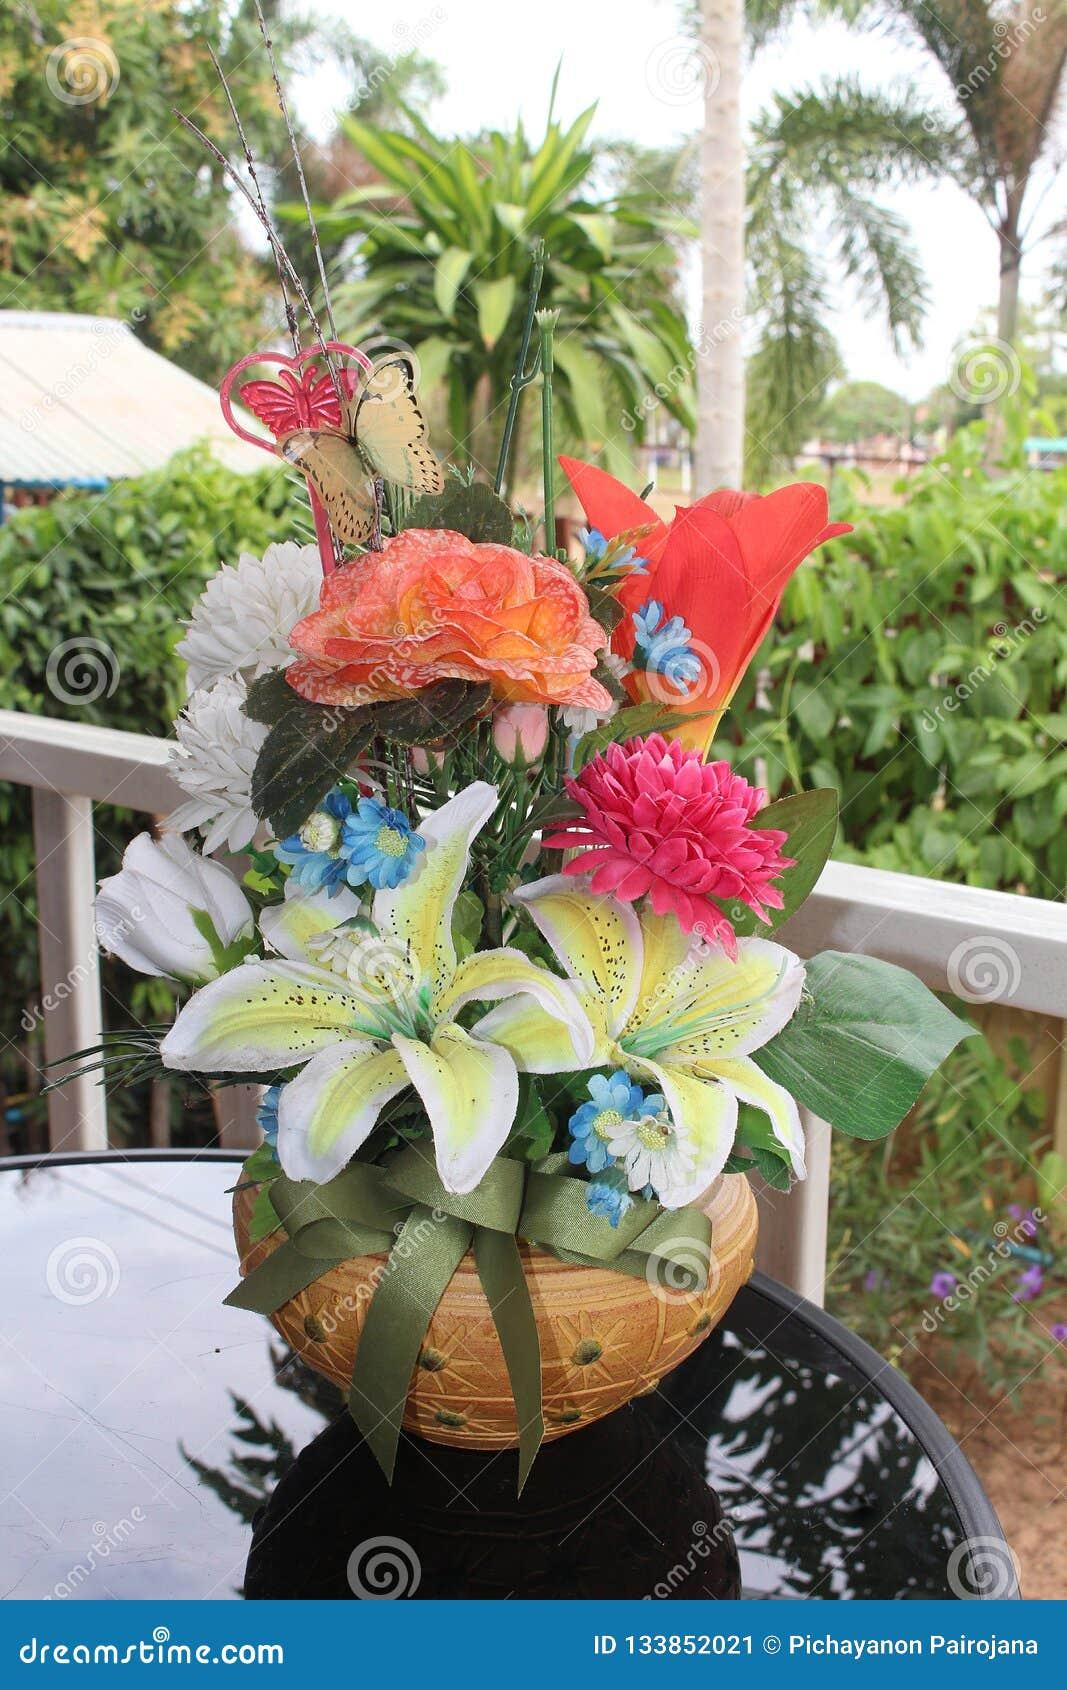 Be handmade goods by Thai people.